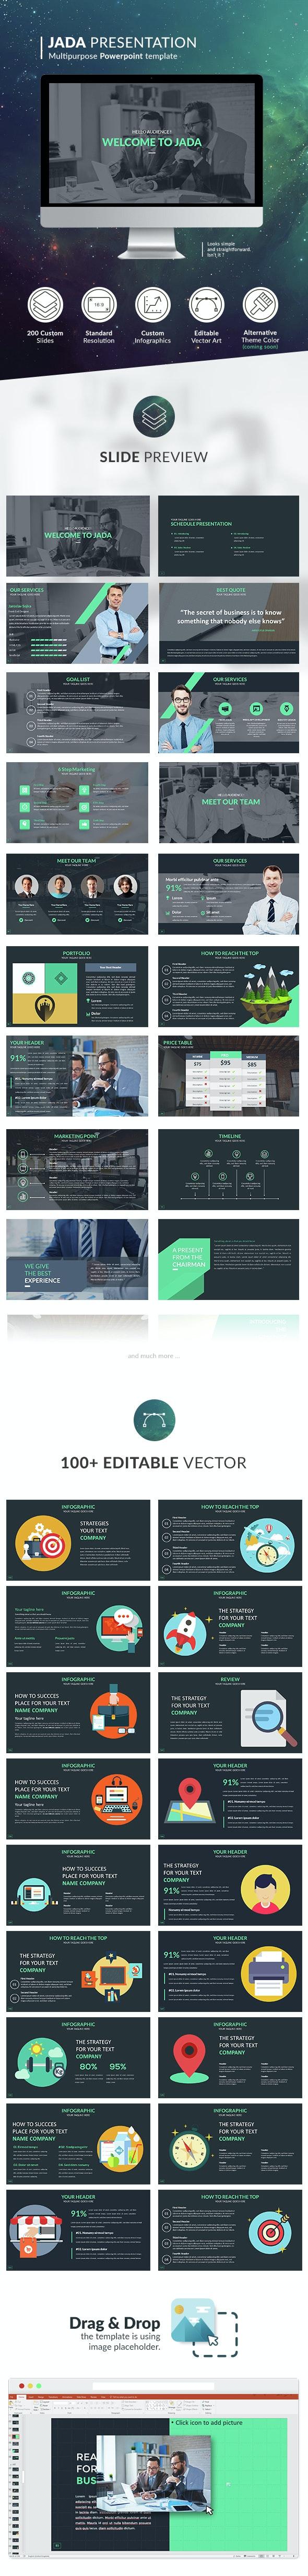 Jada - Multipurpose Presentation Template - Business PowerPoint Templates